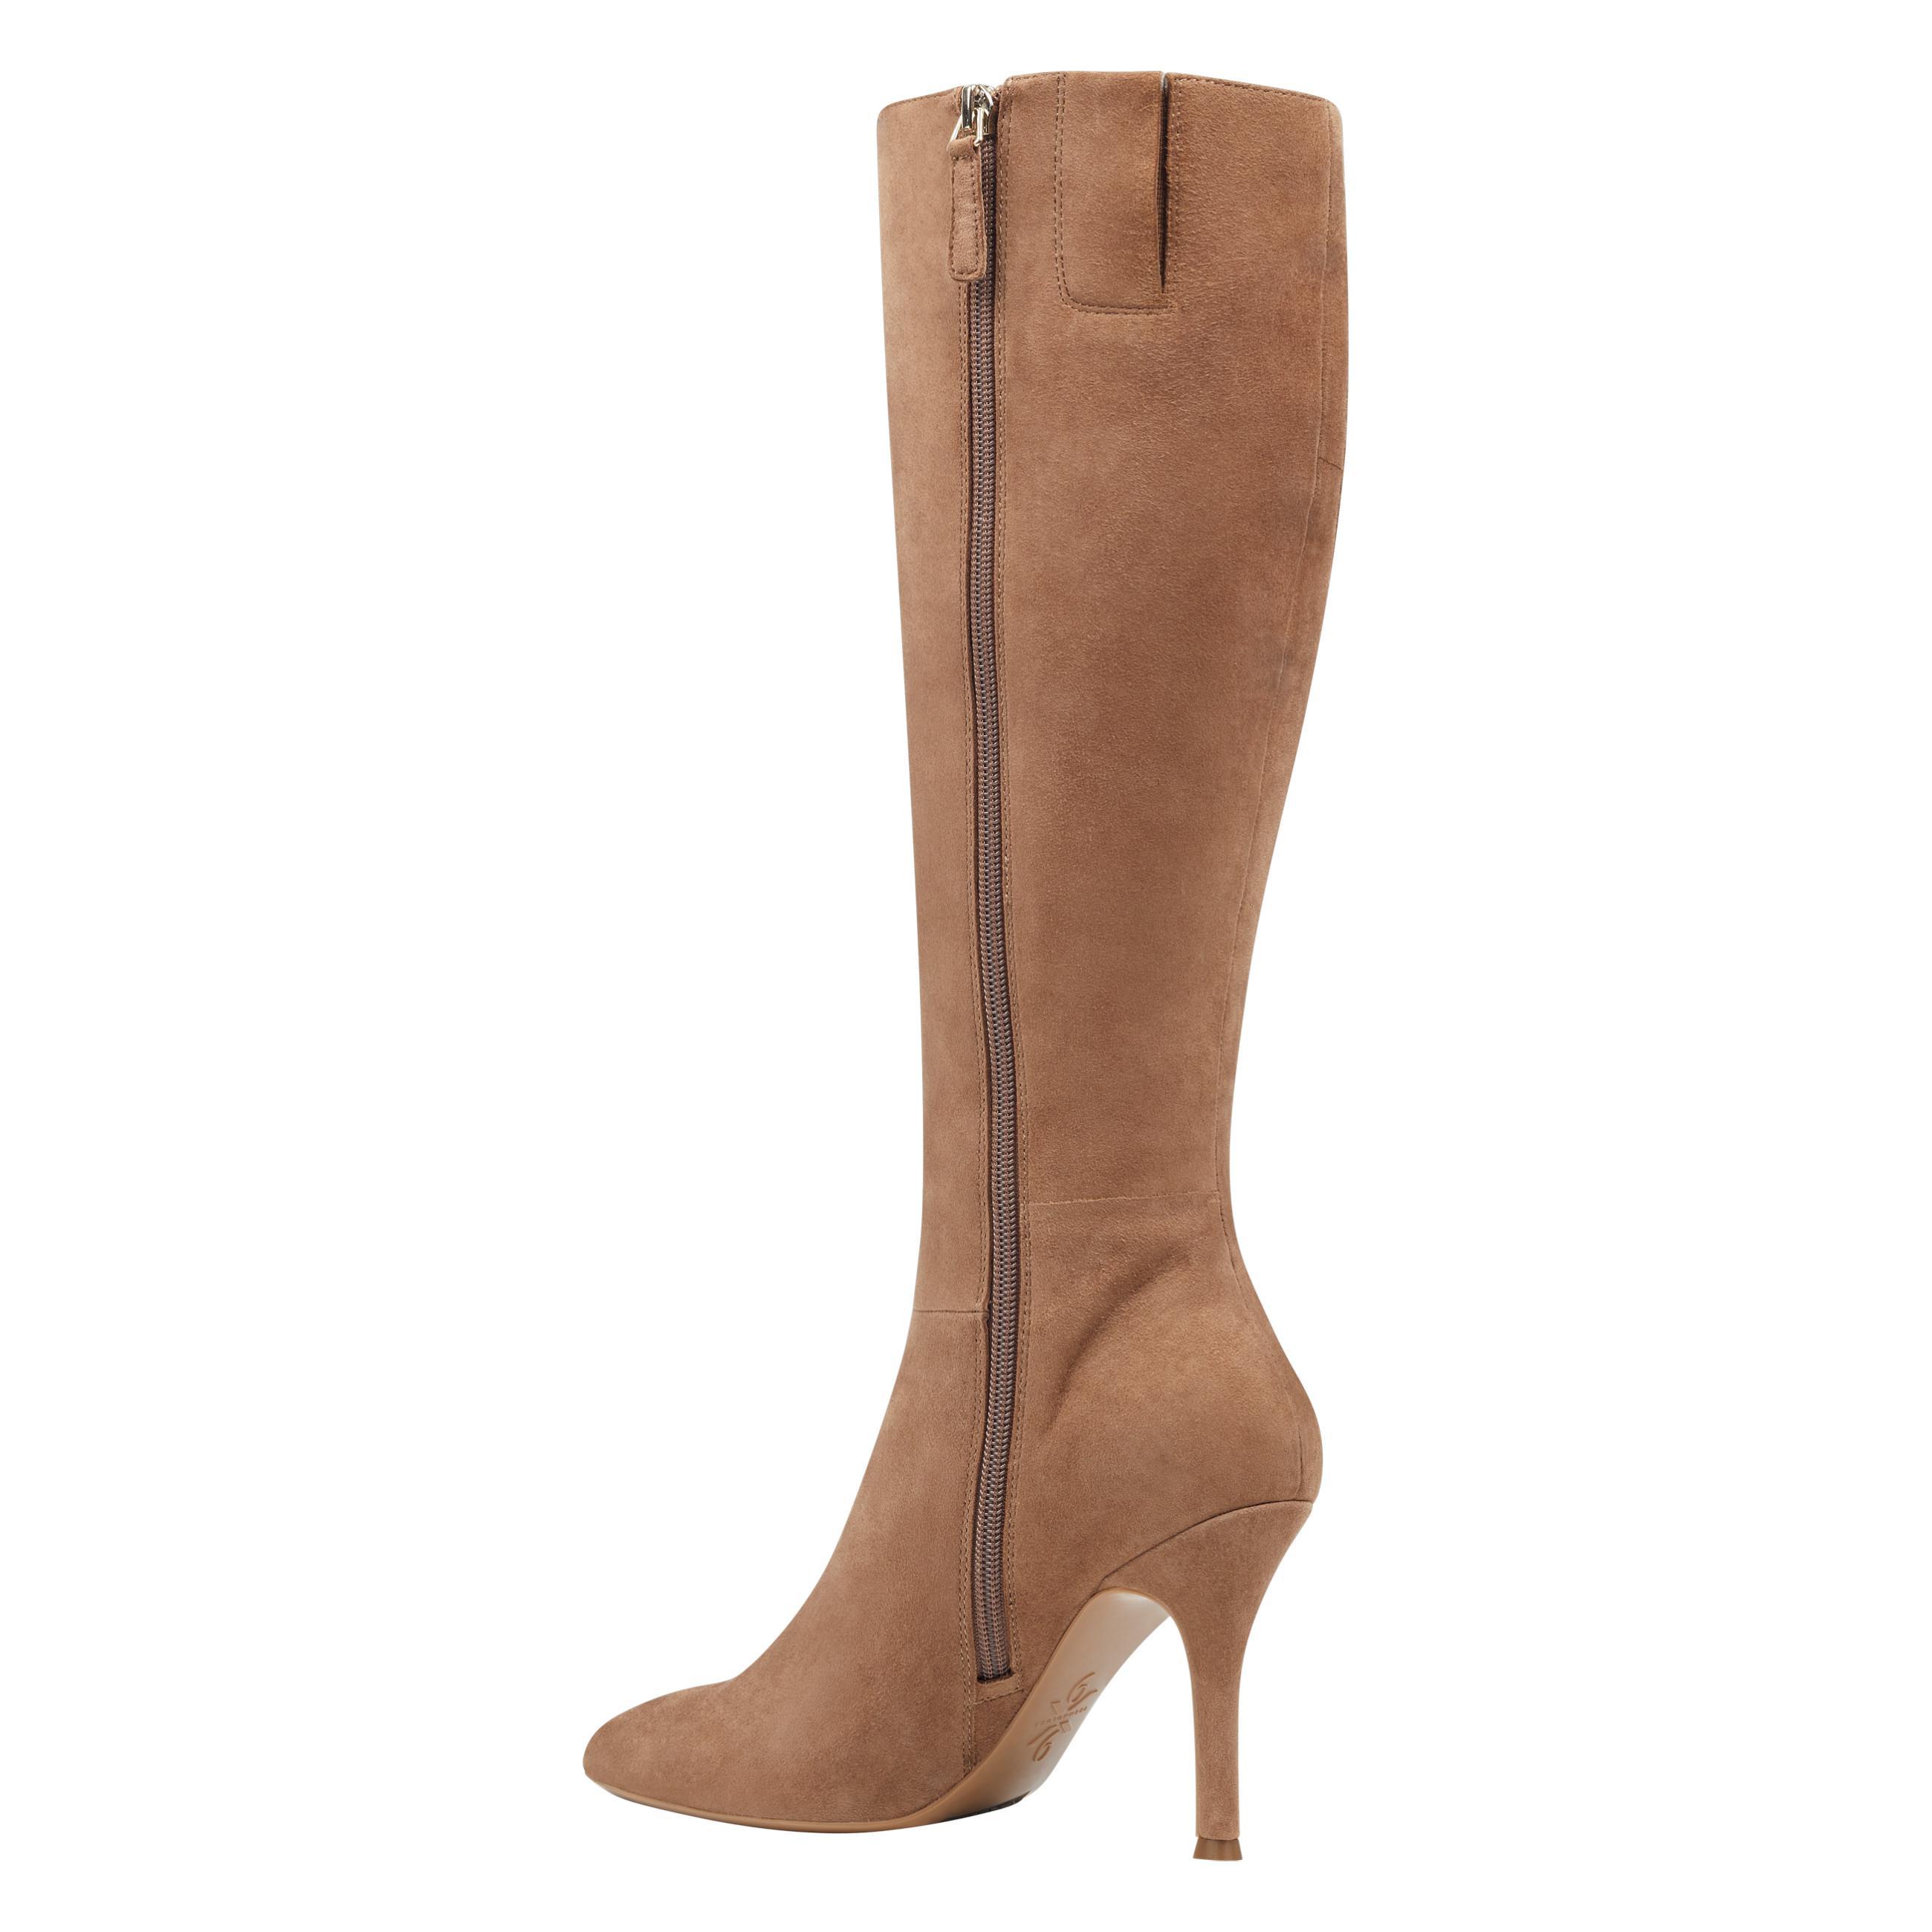 fee82b526da7 Nine West - Brown Fame Wide Calf Knee High Boots - Lyst. View fullscreen